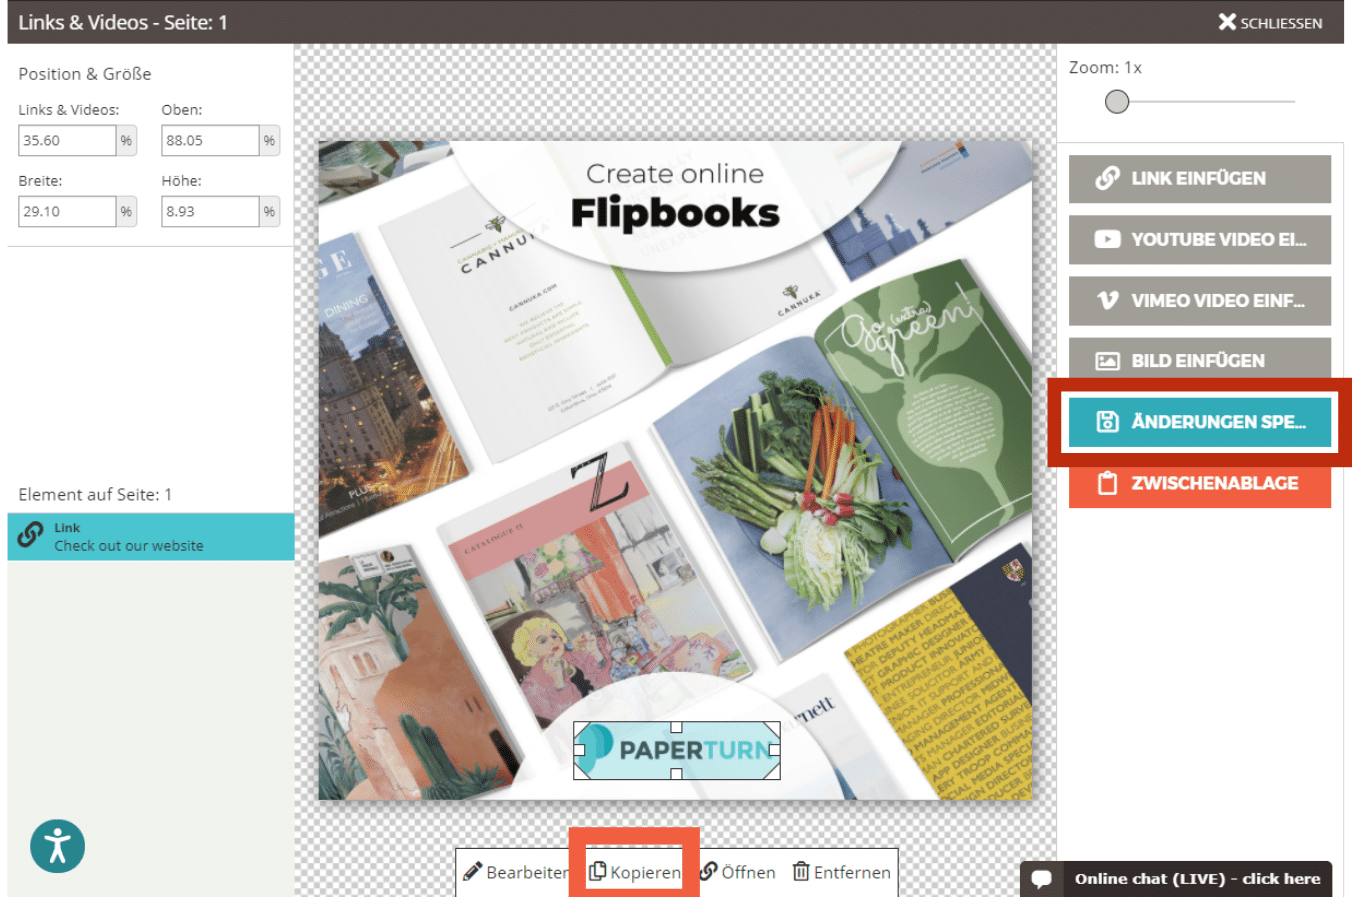 Paperturn Flipbook-Editor mit den Buttons